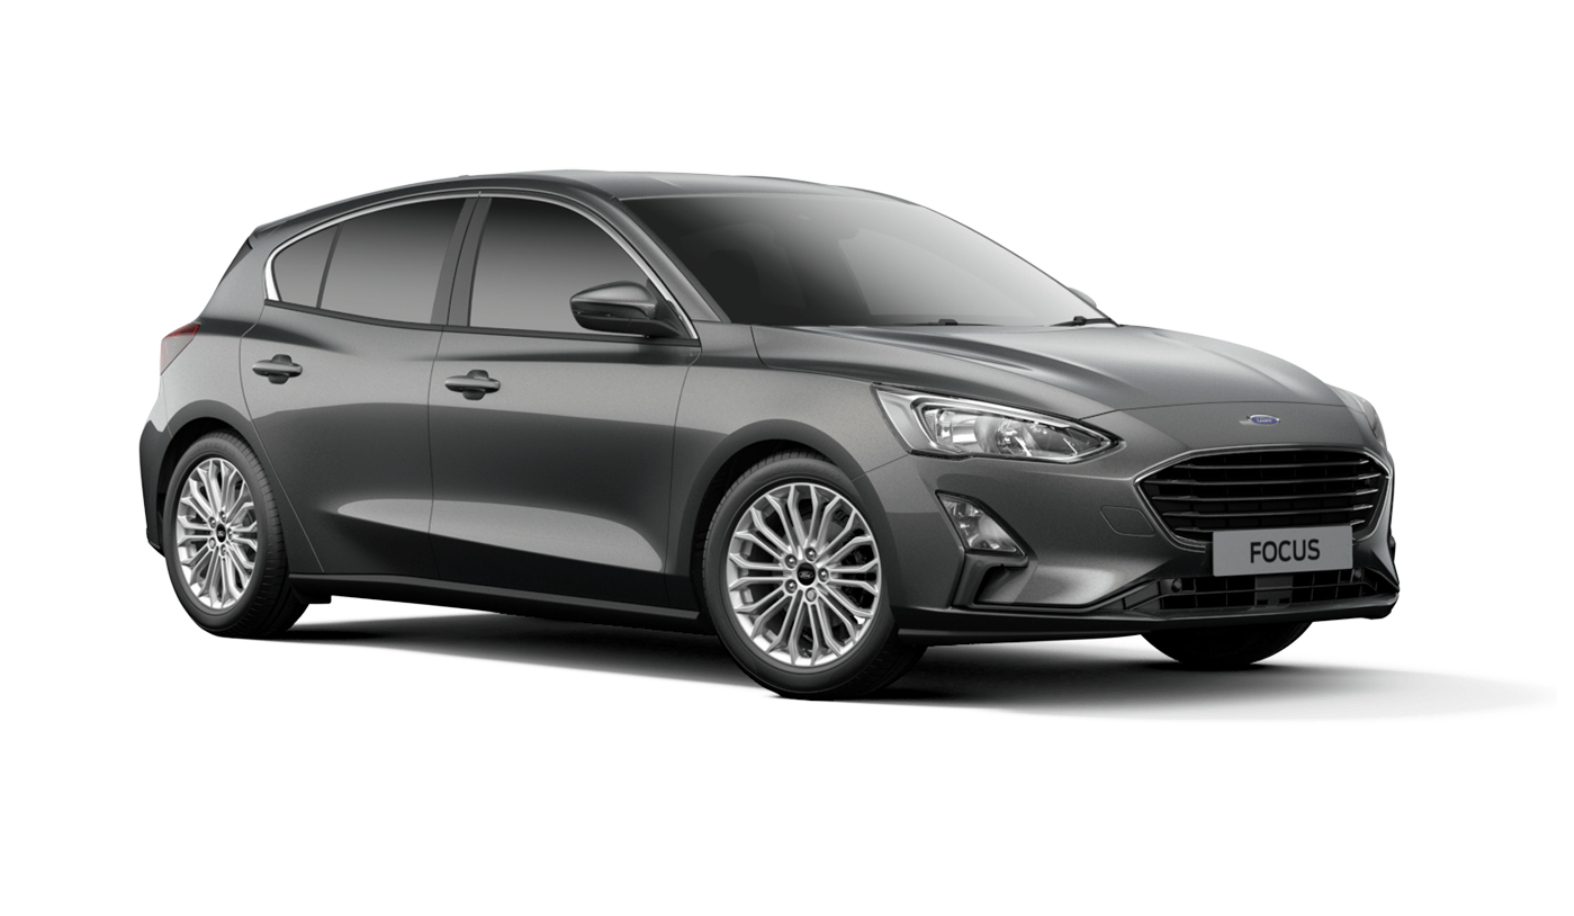 Ford Focus Vignale 1.0L Ford EcoBoost 125PS 6 Speed 5 door Hatchback (2020)